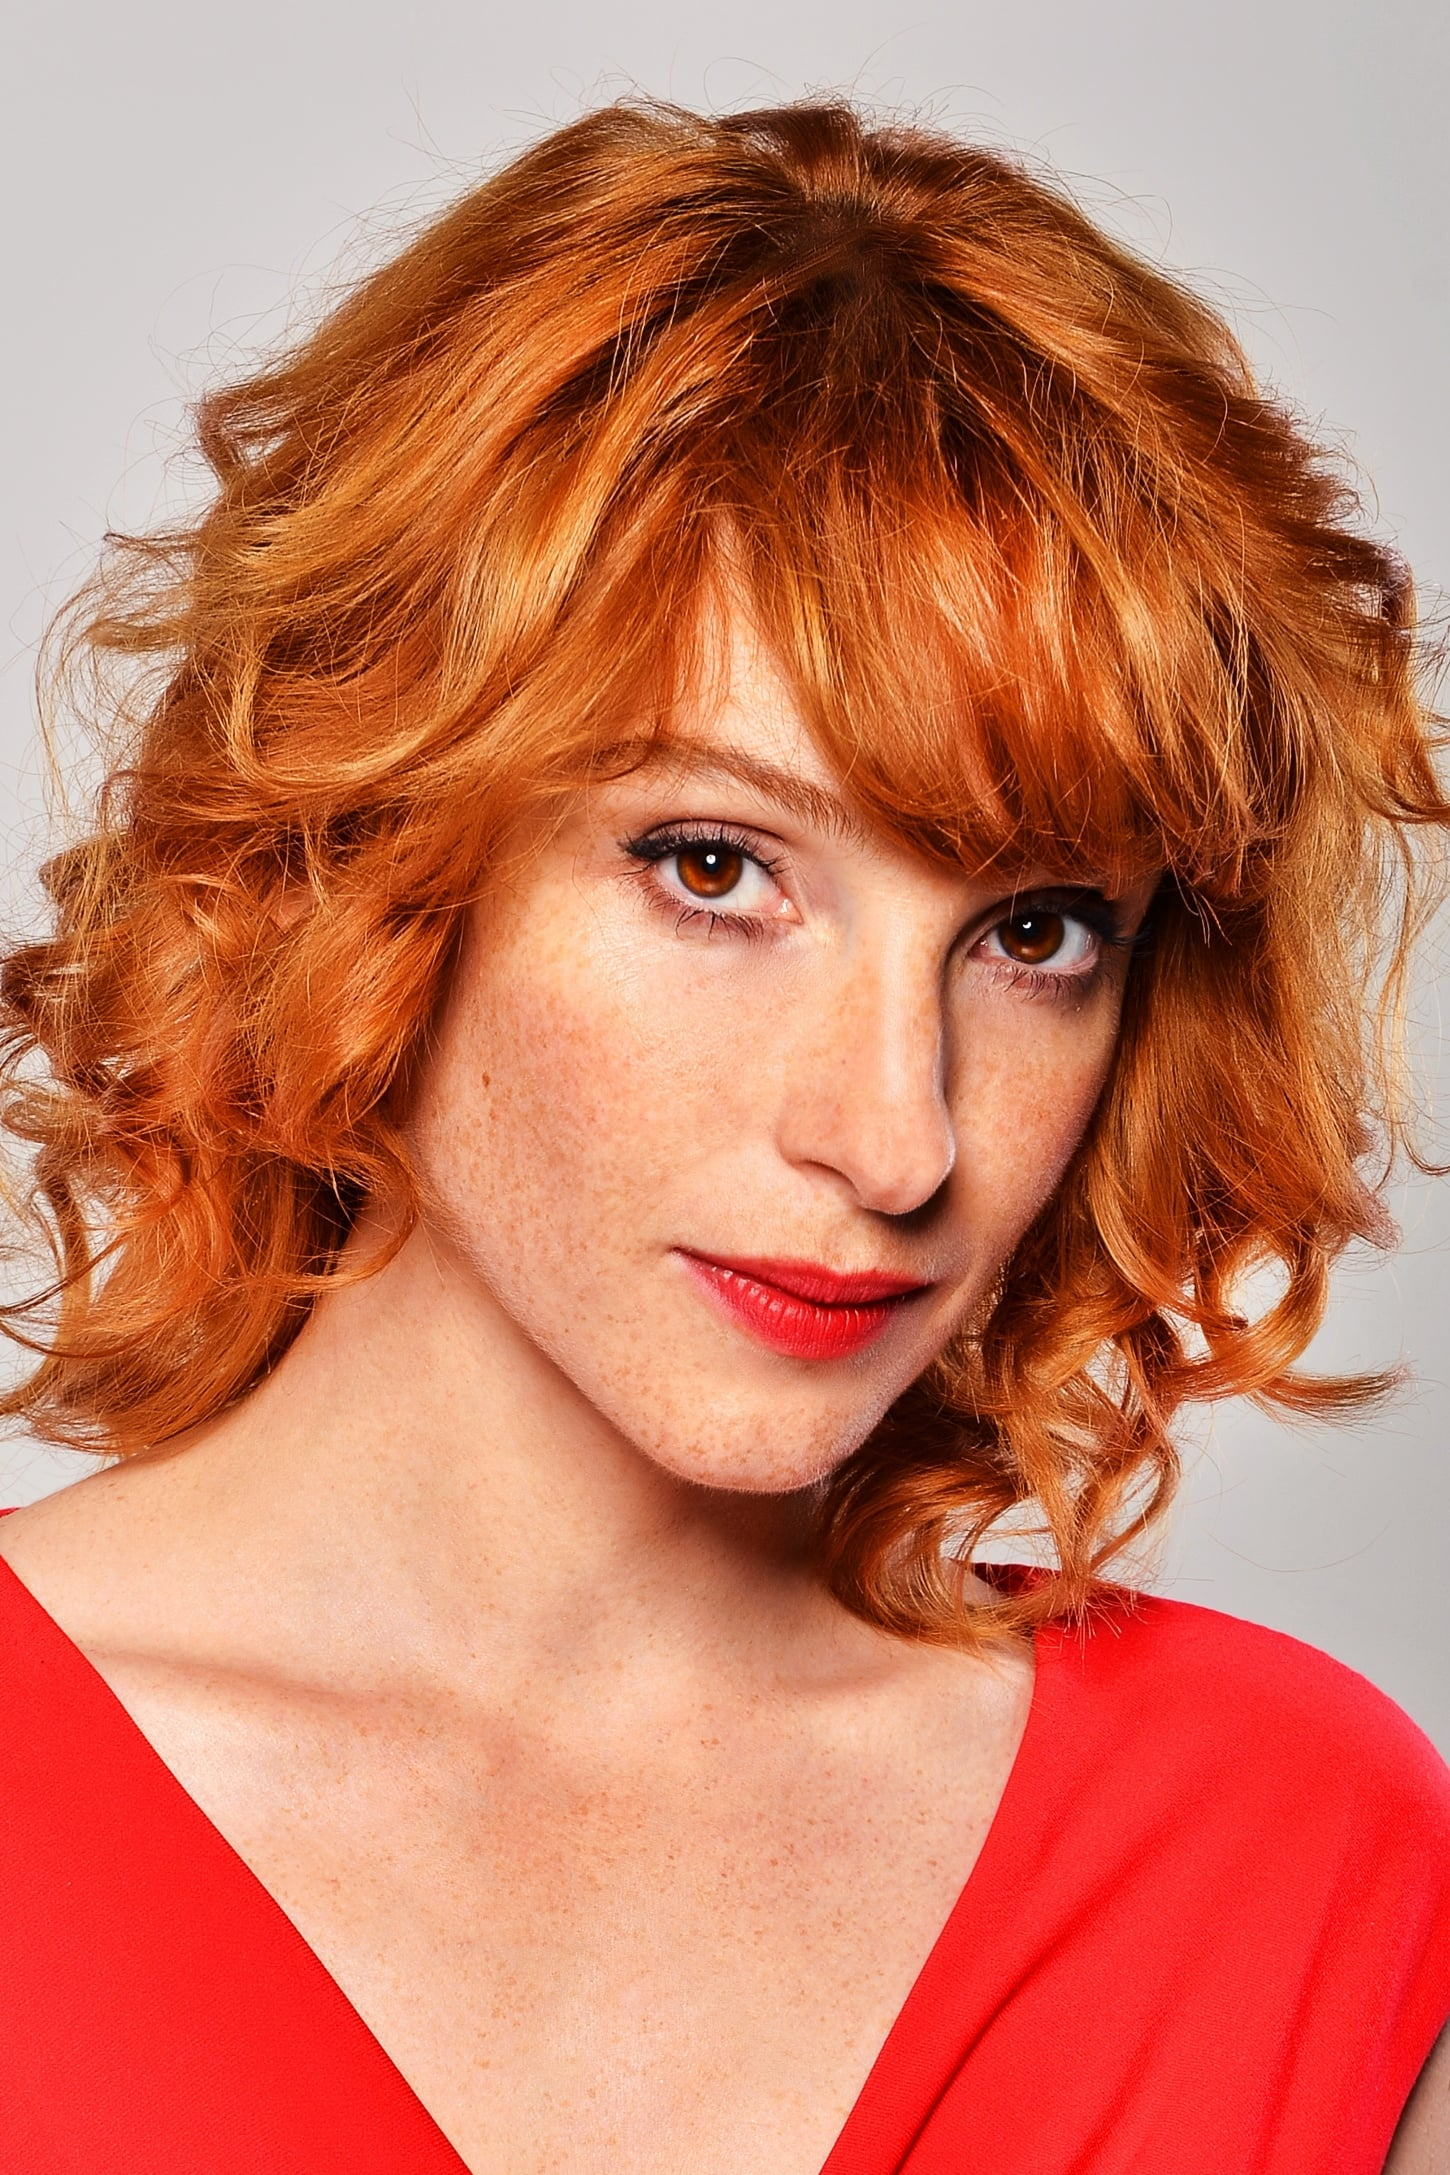 Vica Kerekes - Profile Images — The Movie Database (TMDb)